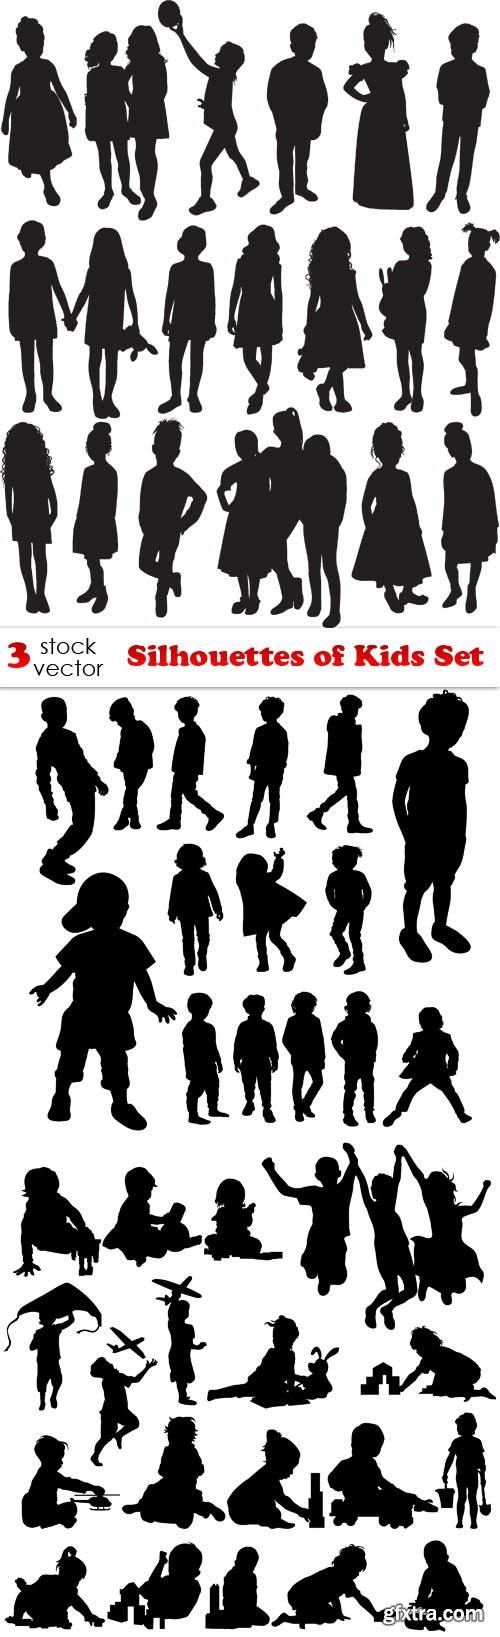 Vectors - Silhouettes of Kids Set